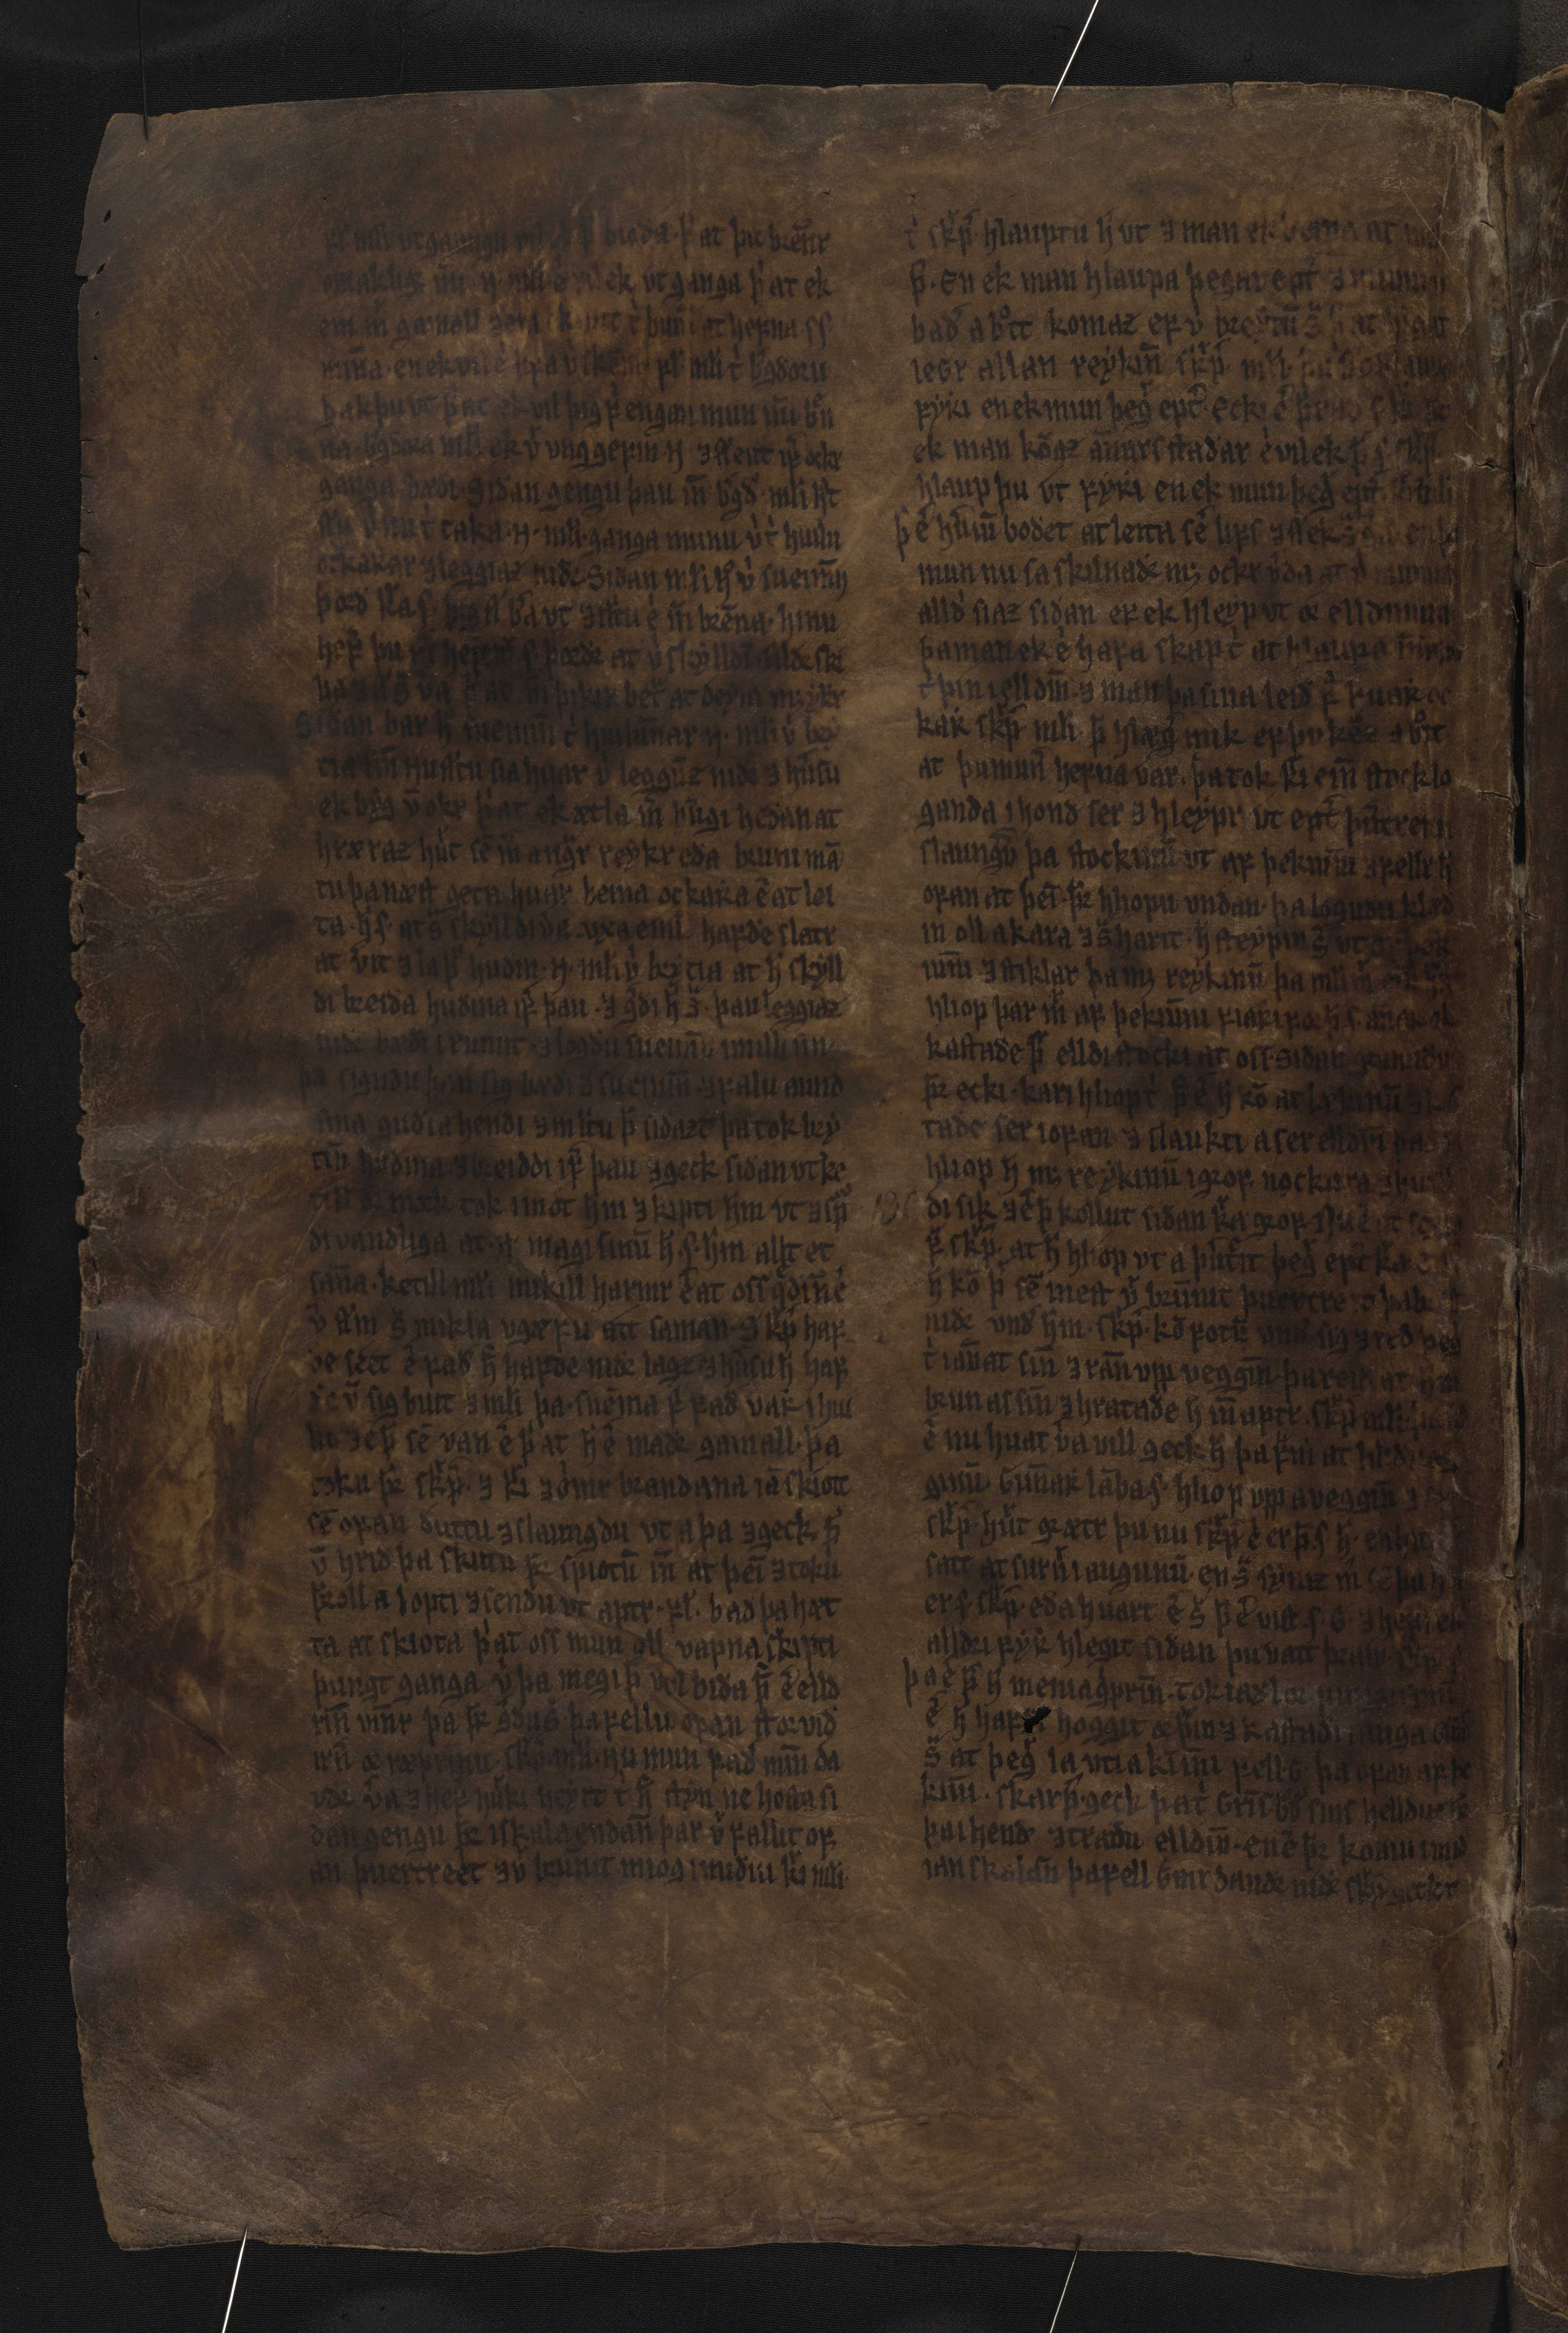 AM 132 fol - 45v